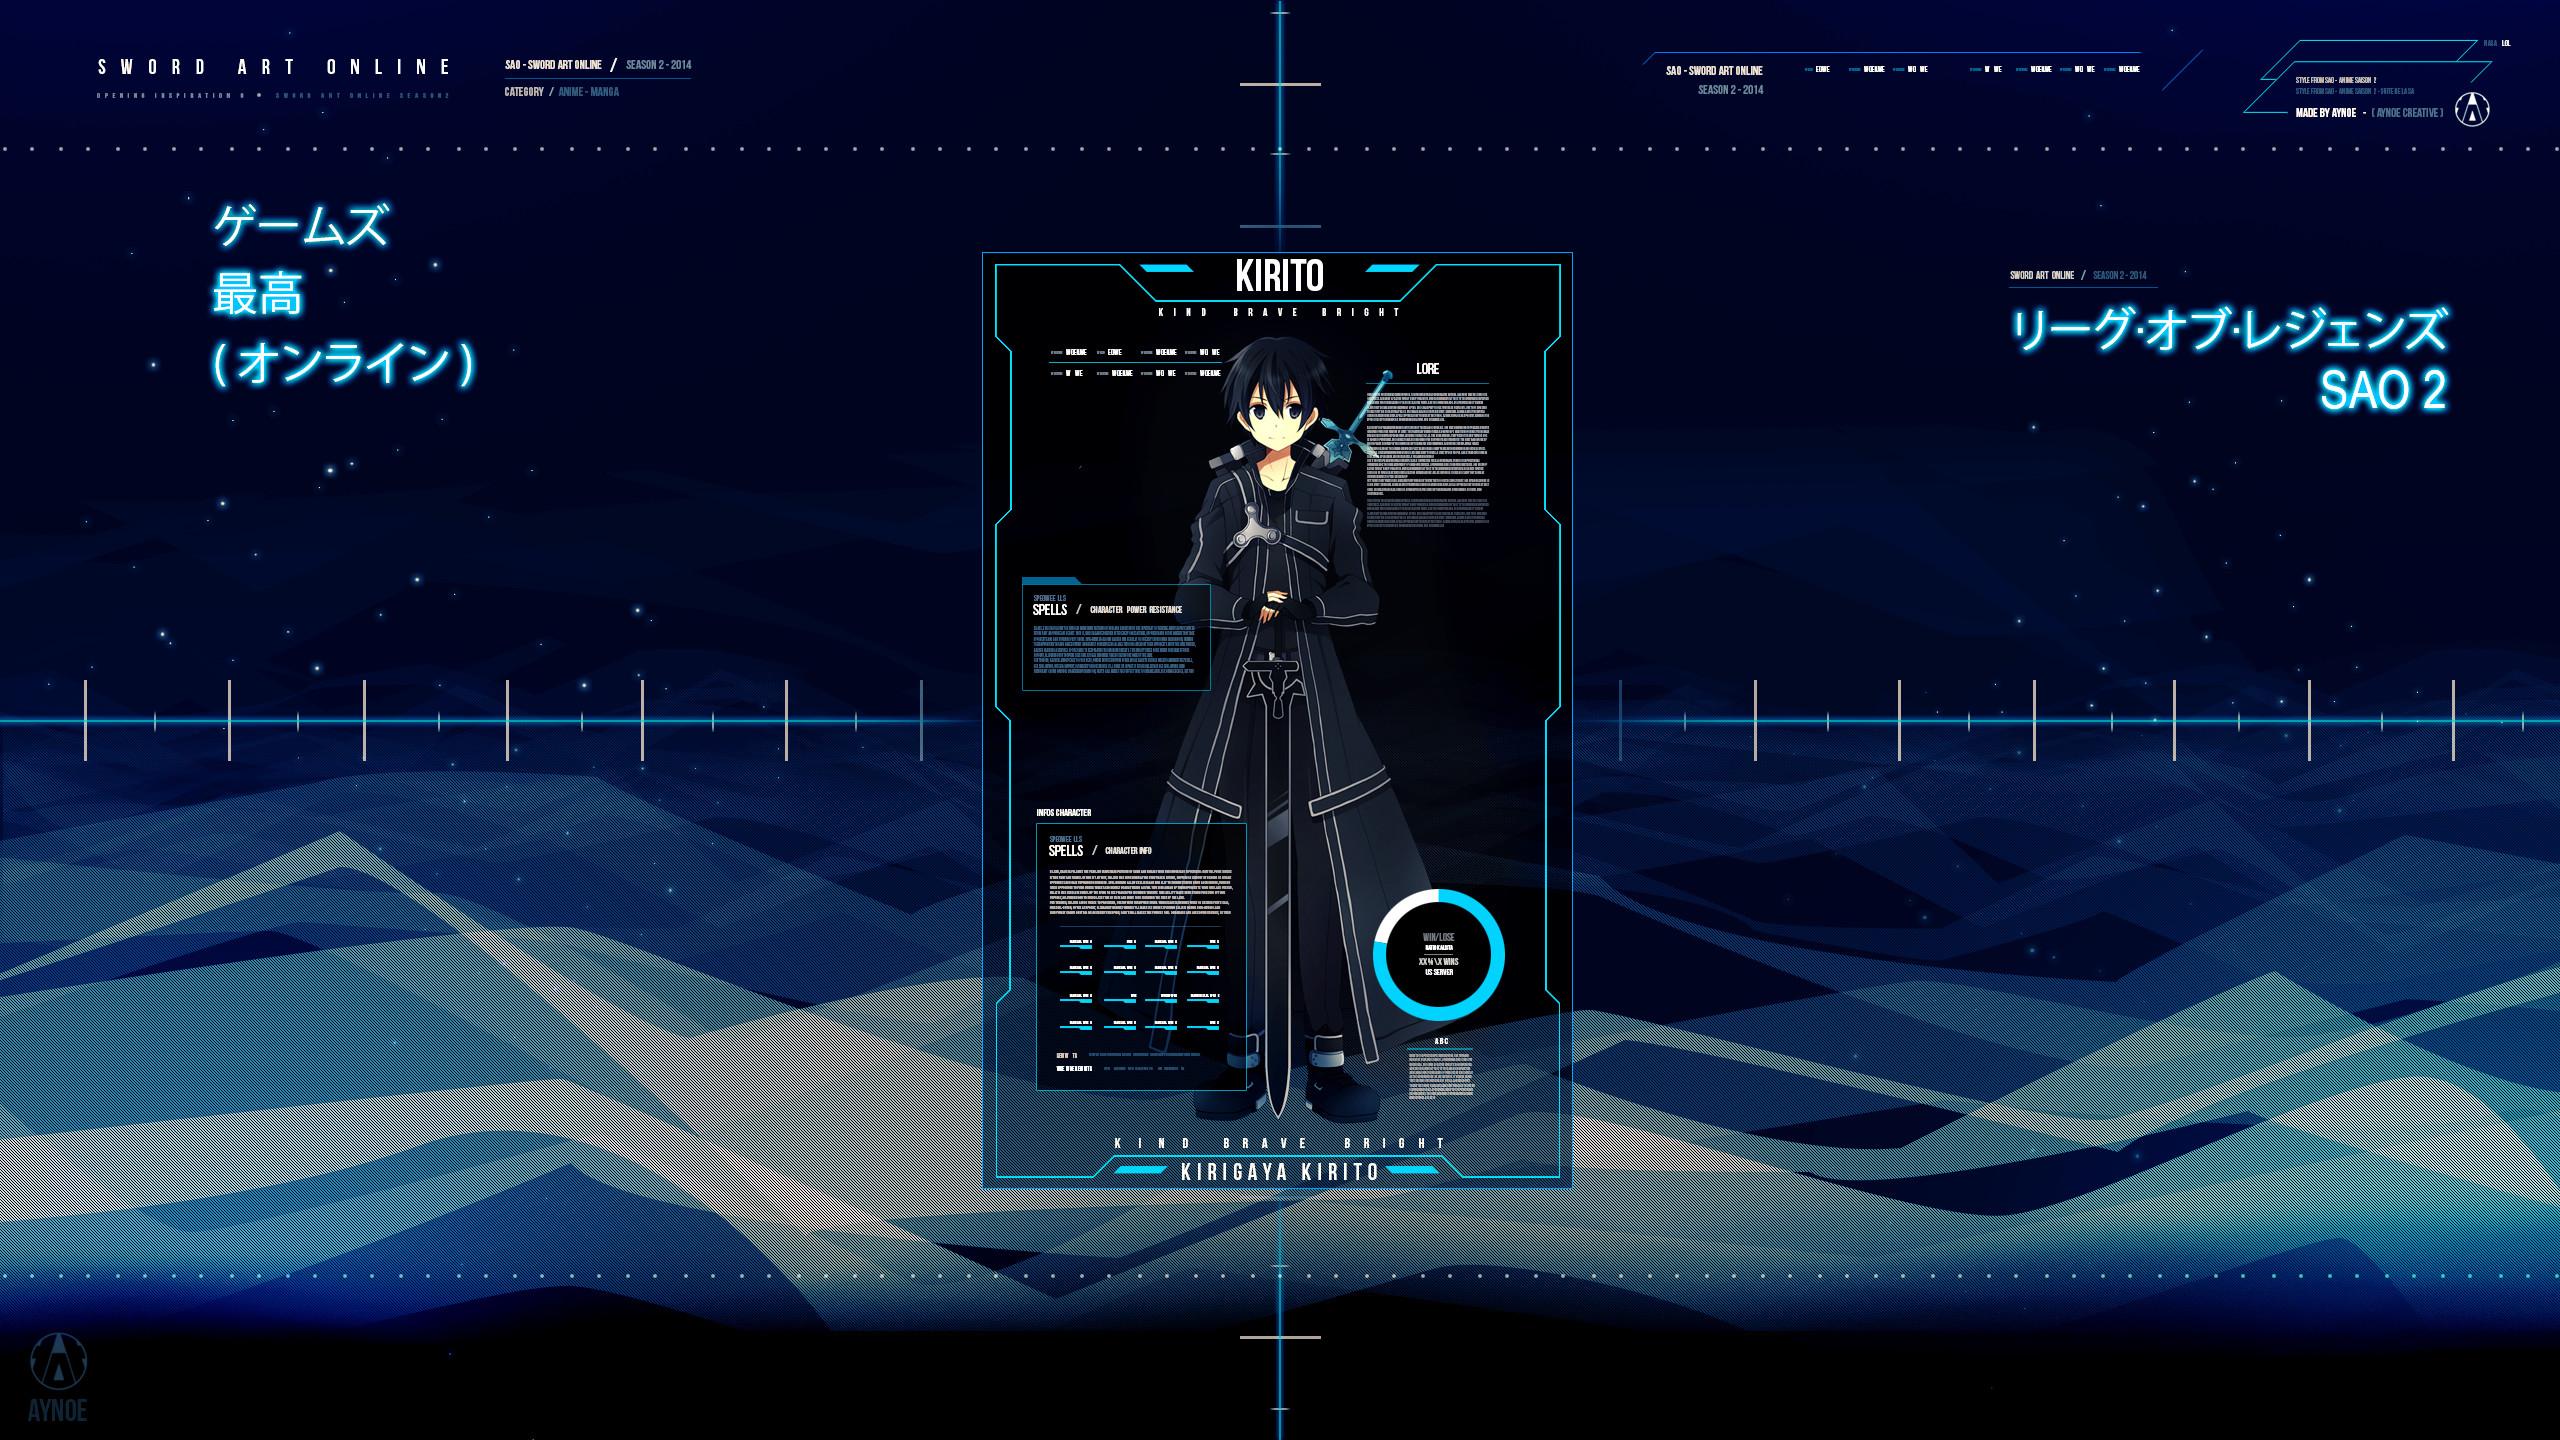 … Kirito – Sword Art Online – Wallpaper by Aynoe